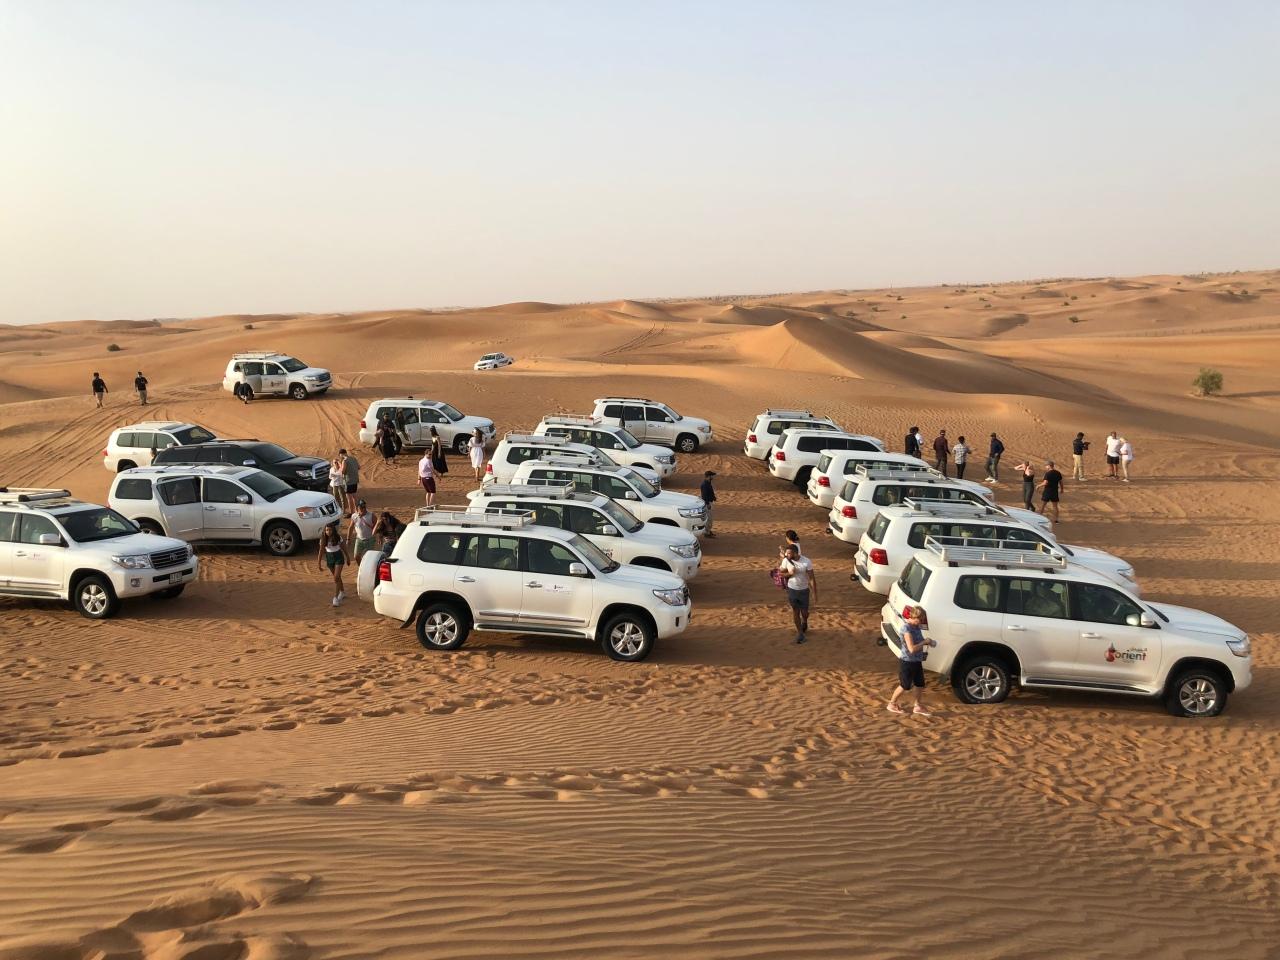 Dune bashing instagram vs reality Dubai